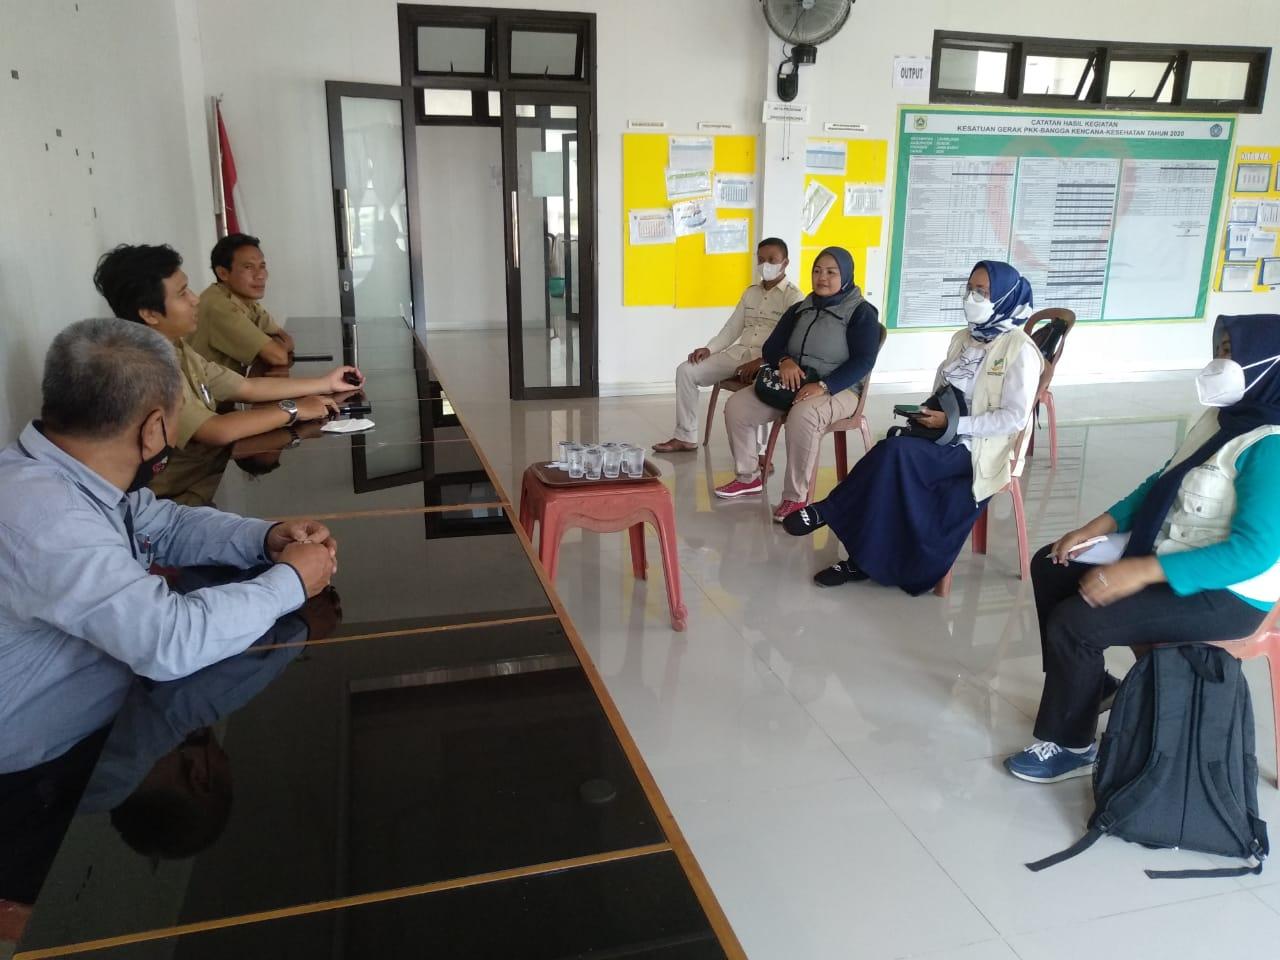 Rapat terbatas bersama IPSM Kecamatan Leuwiliang di Aula Kecamatan Leuwiliang dalam rangka rencana pelaksanaan Muscam IPSM Kecamatan Leuwiliang.